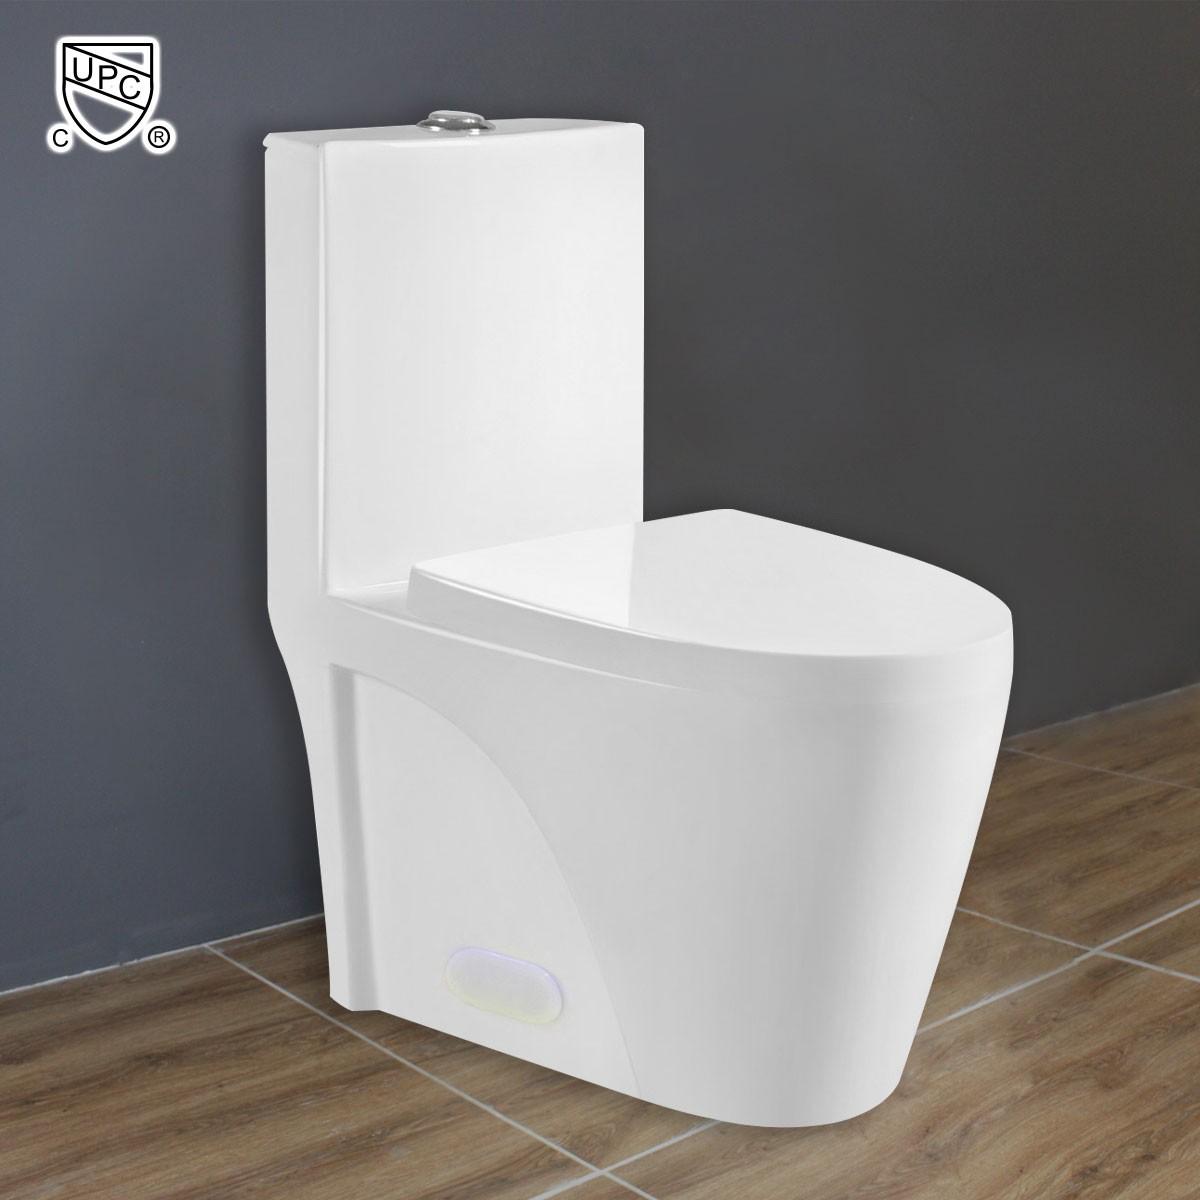 CUPC Dual Flush Water Saving Ceramic One-piece Toilet (DK-ZBQ-12011)